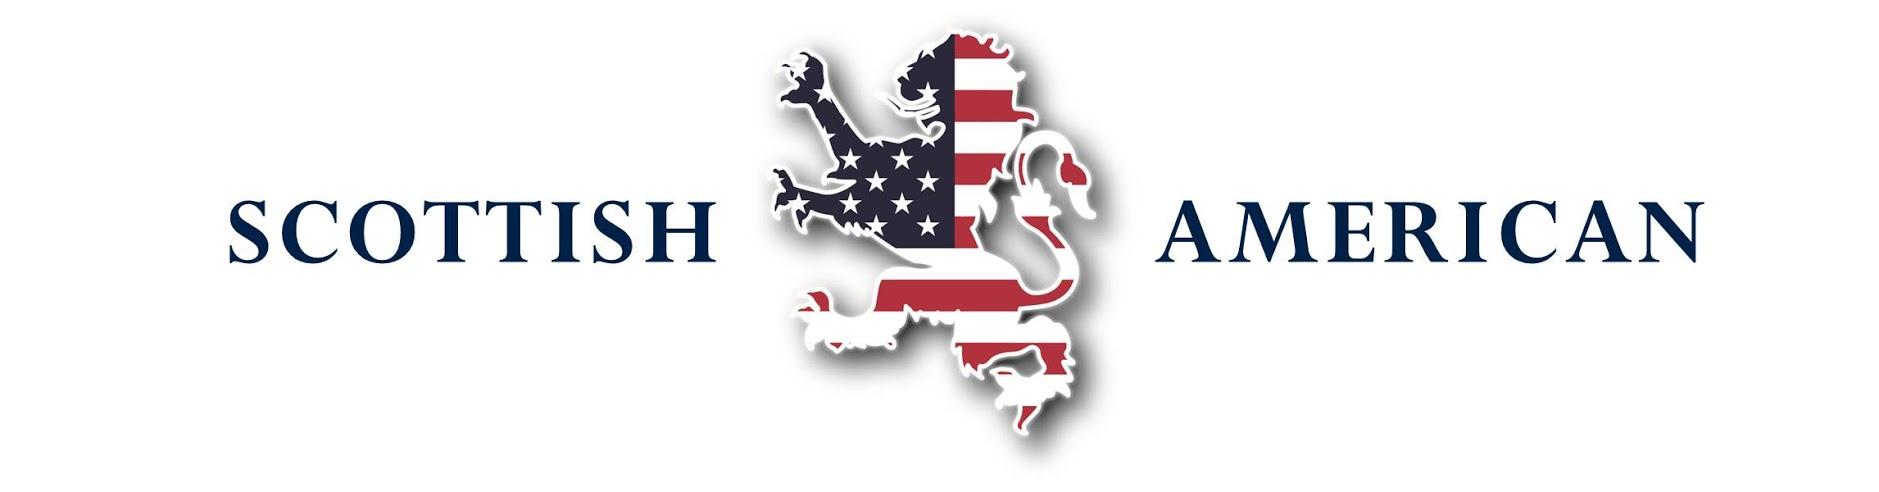 Scottish American logo